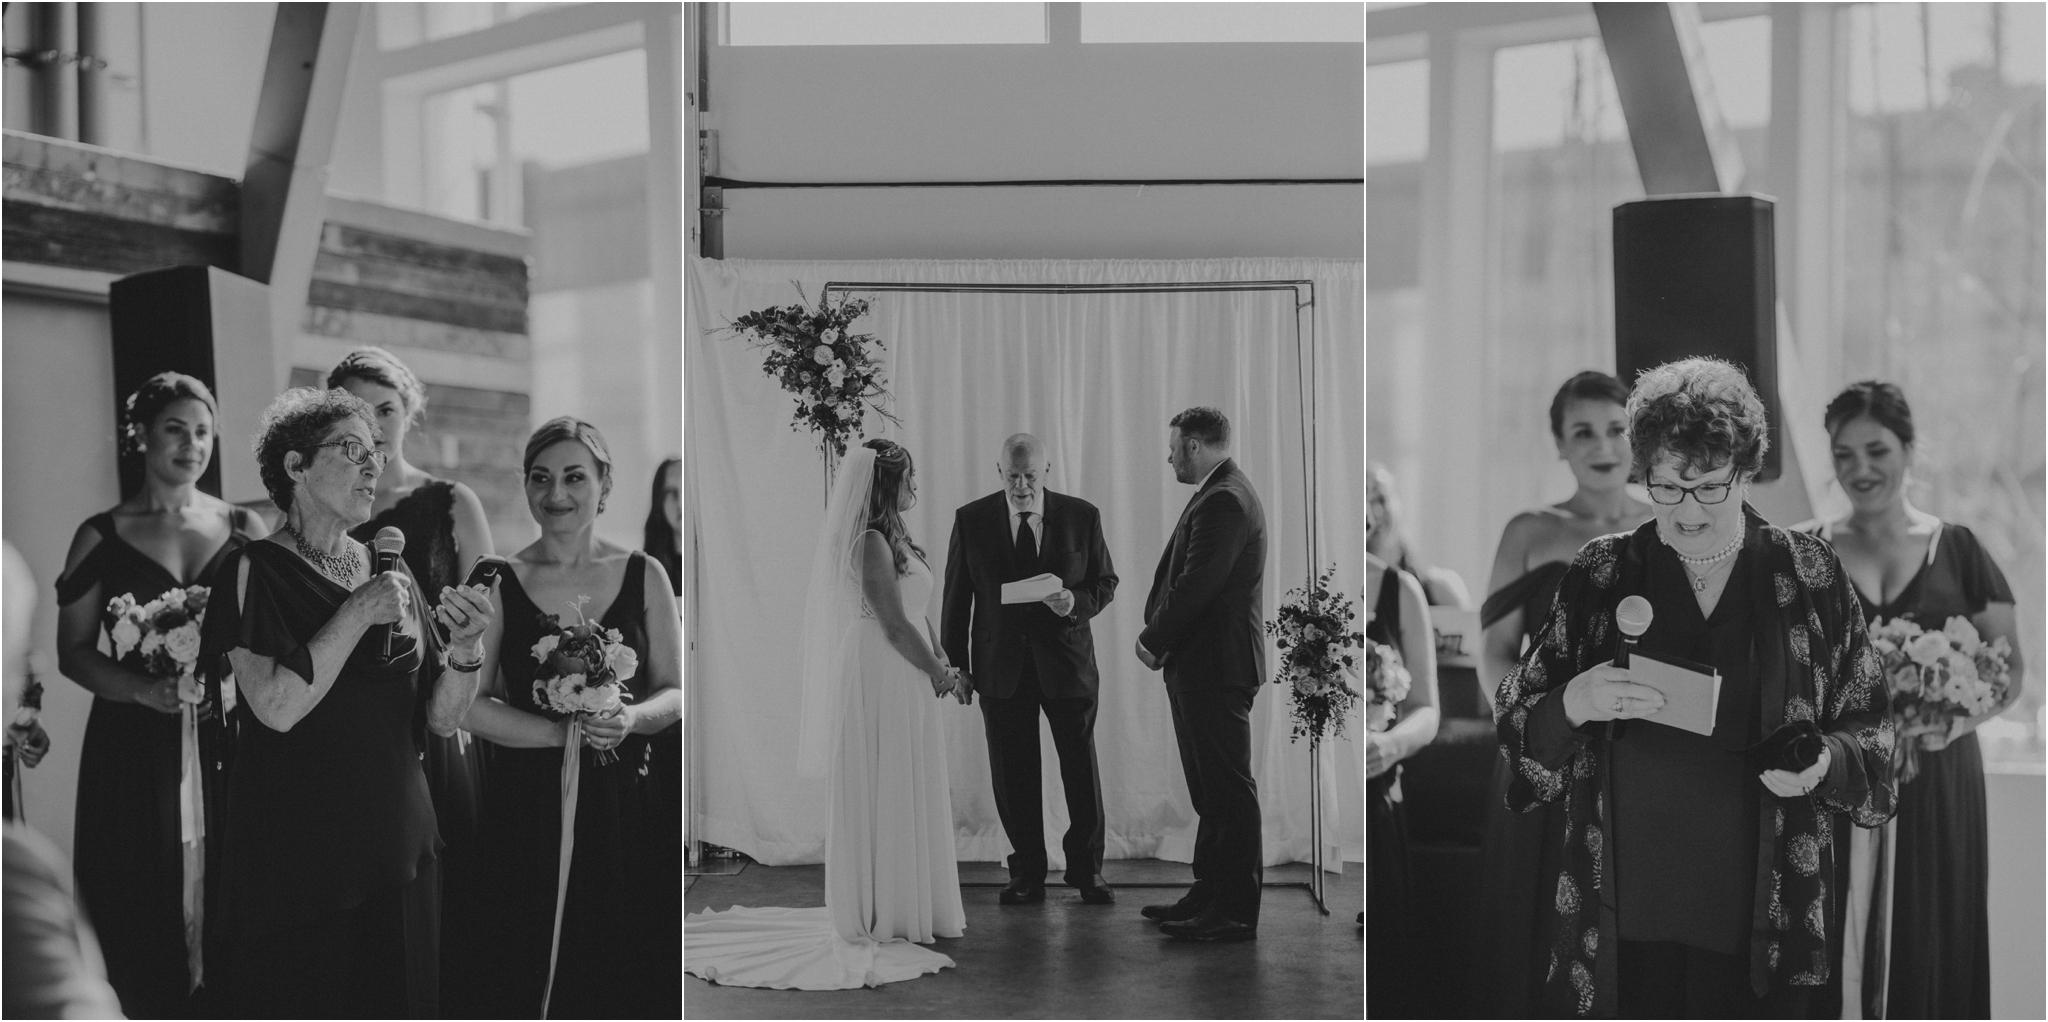 laura-and-matt-metropolist-urban-seattle-wedding-photographer-106.jpg